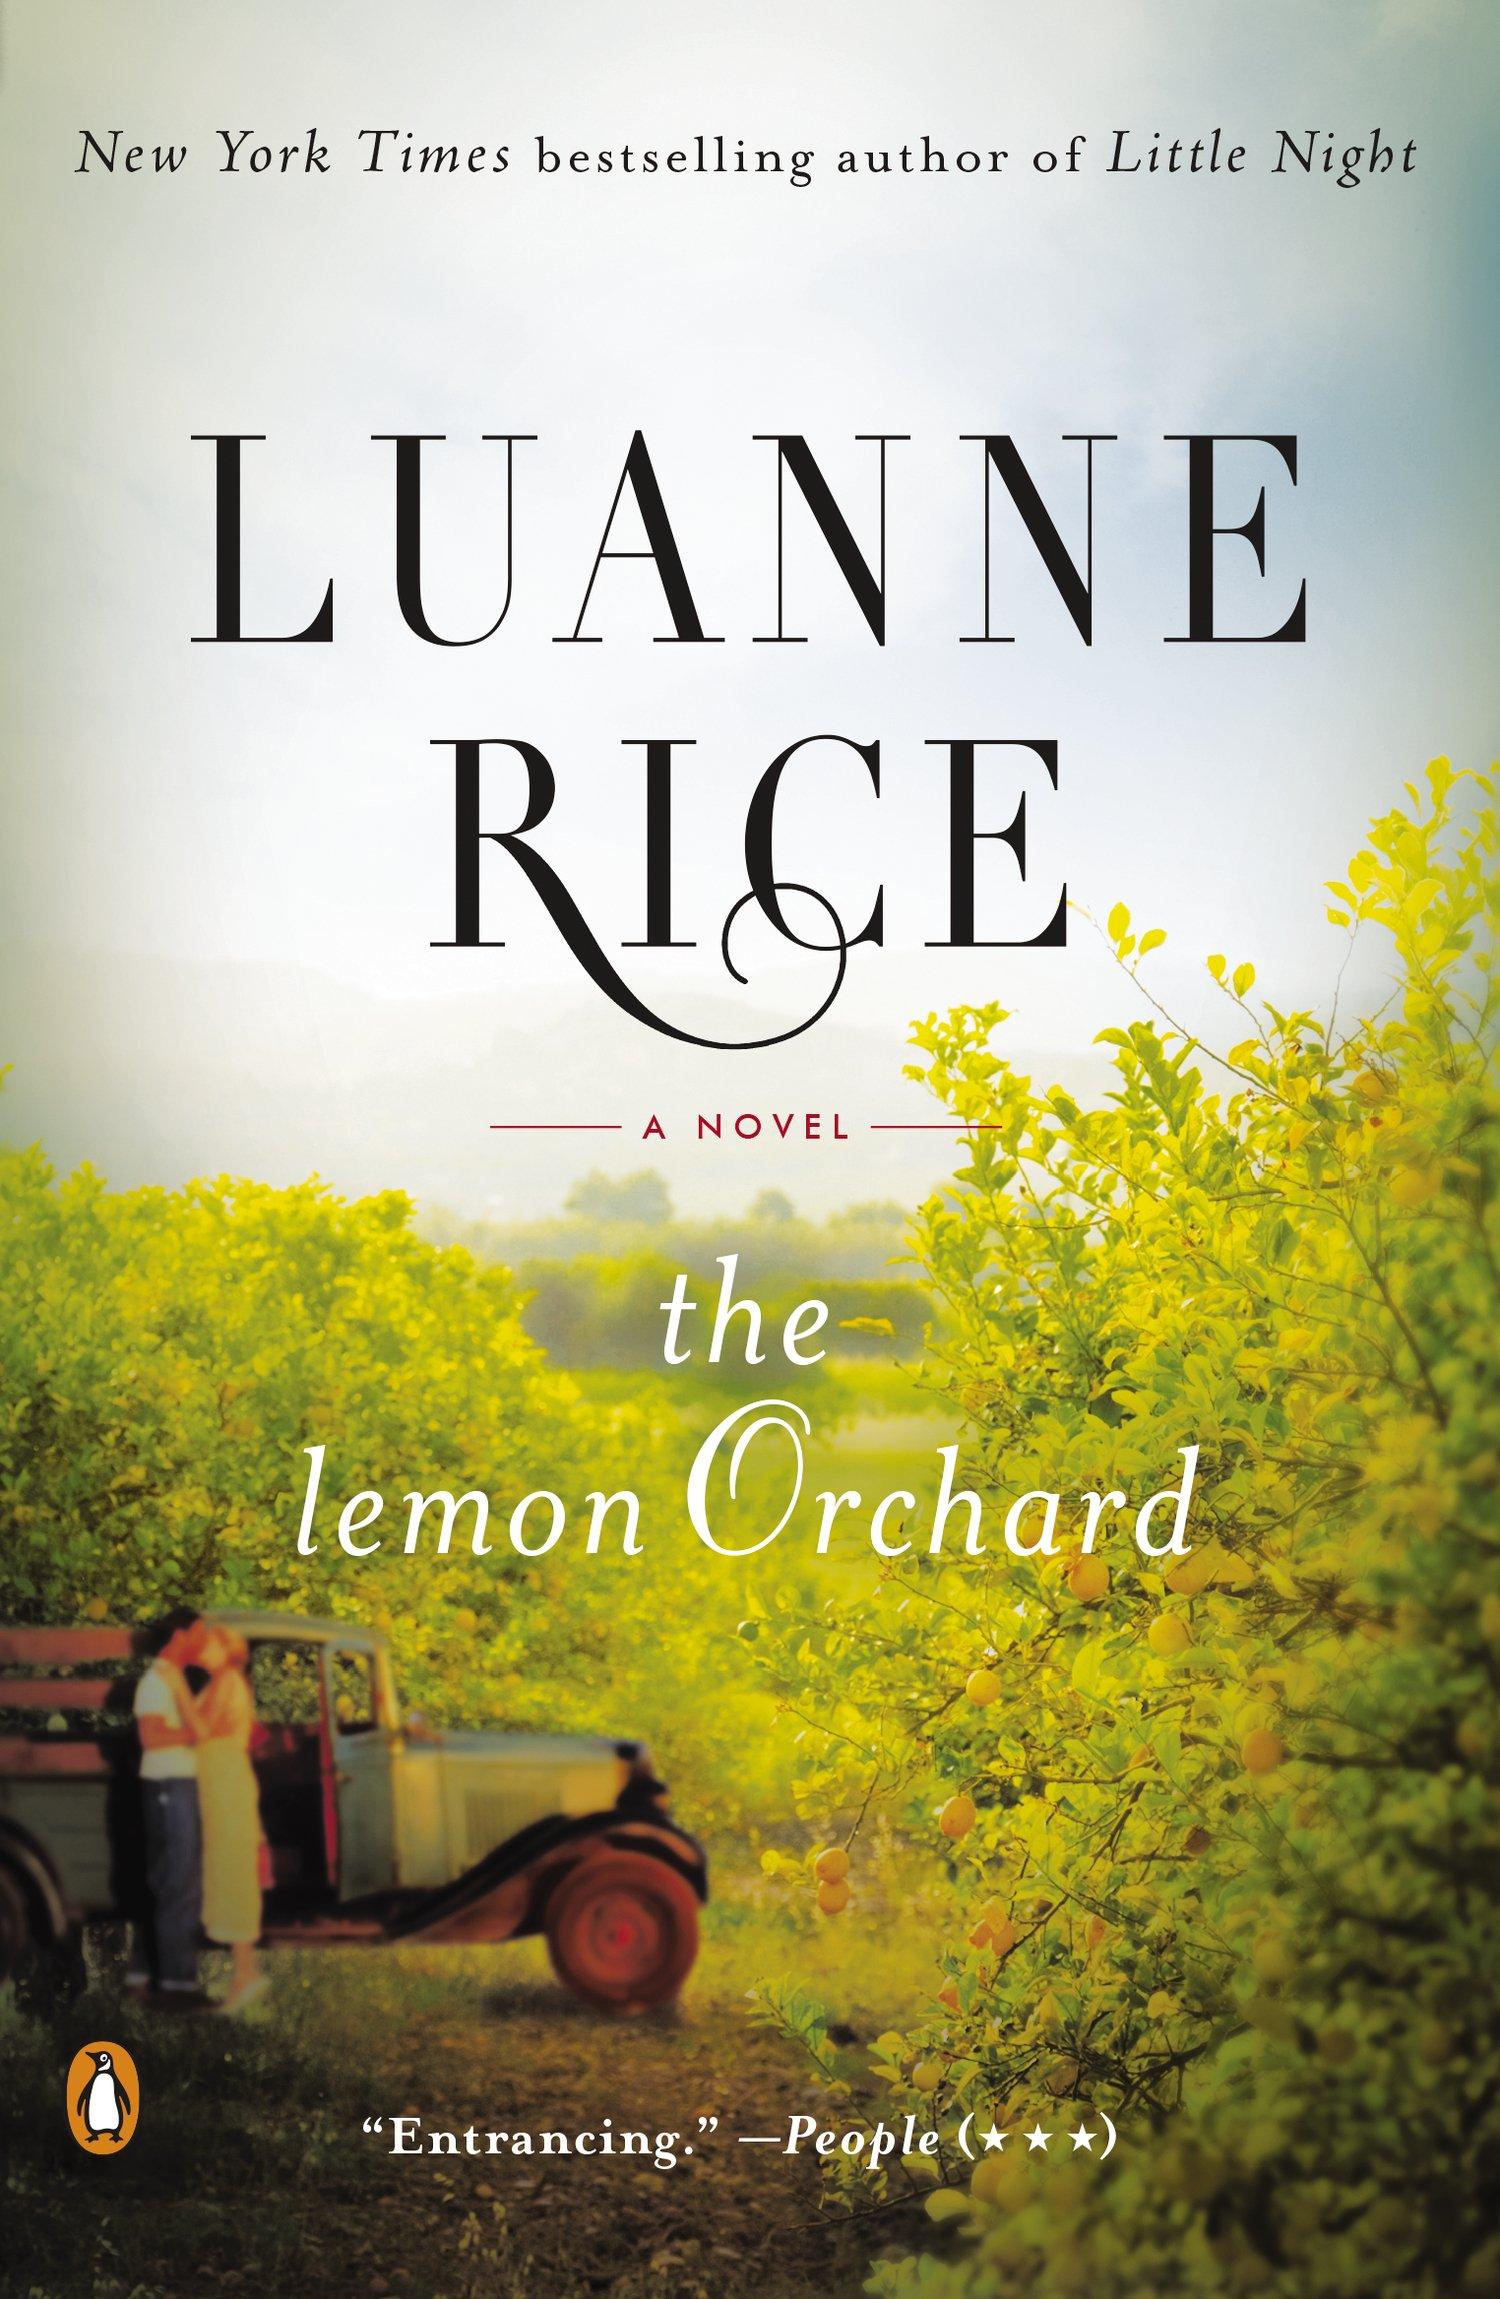 The Lemon Orchard: A Novel: Luanne Rice: 9780143125563: Amazon com